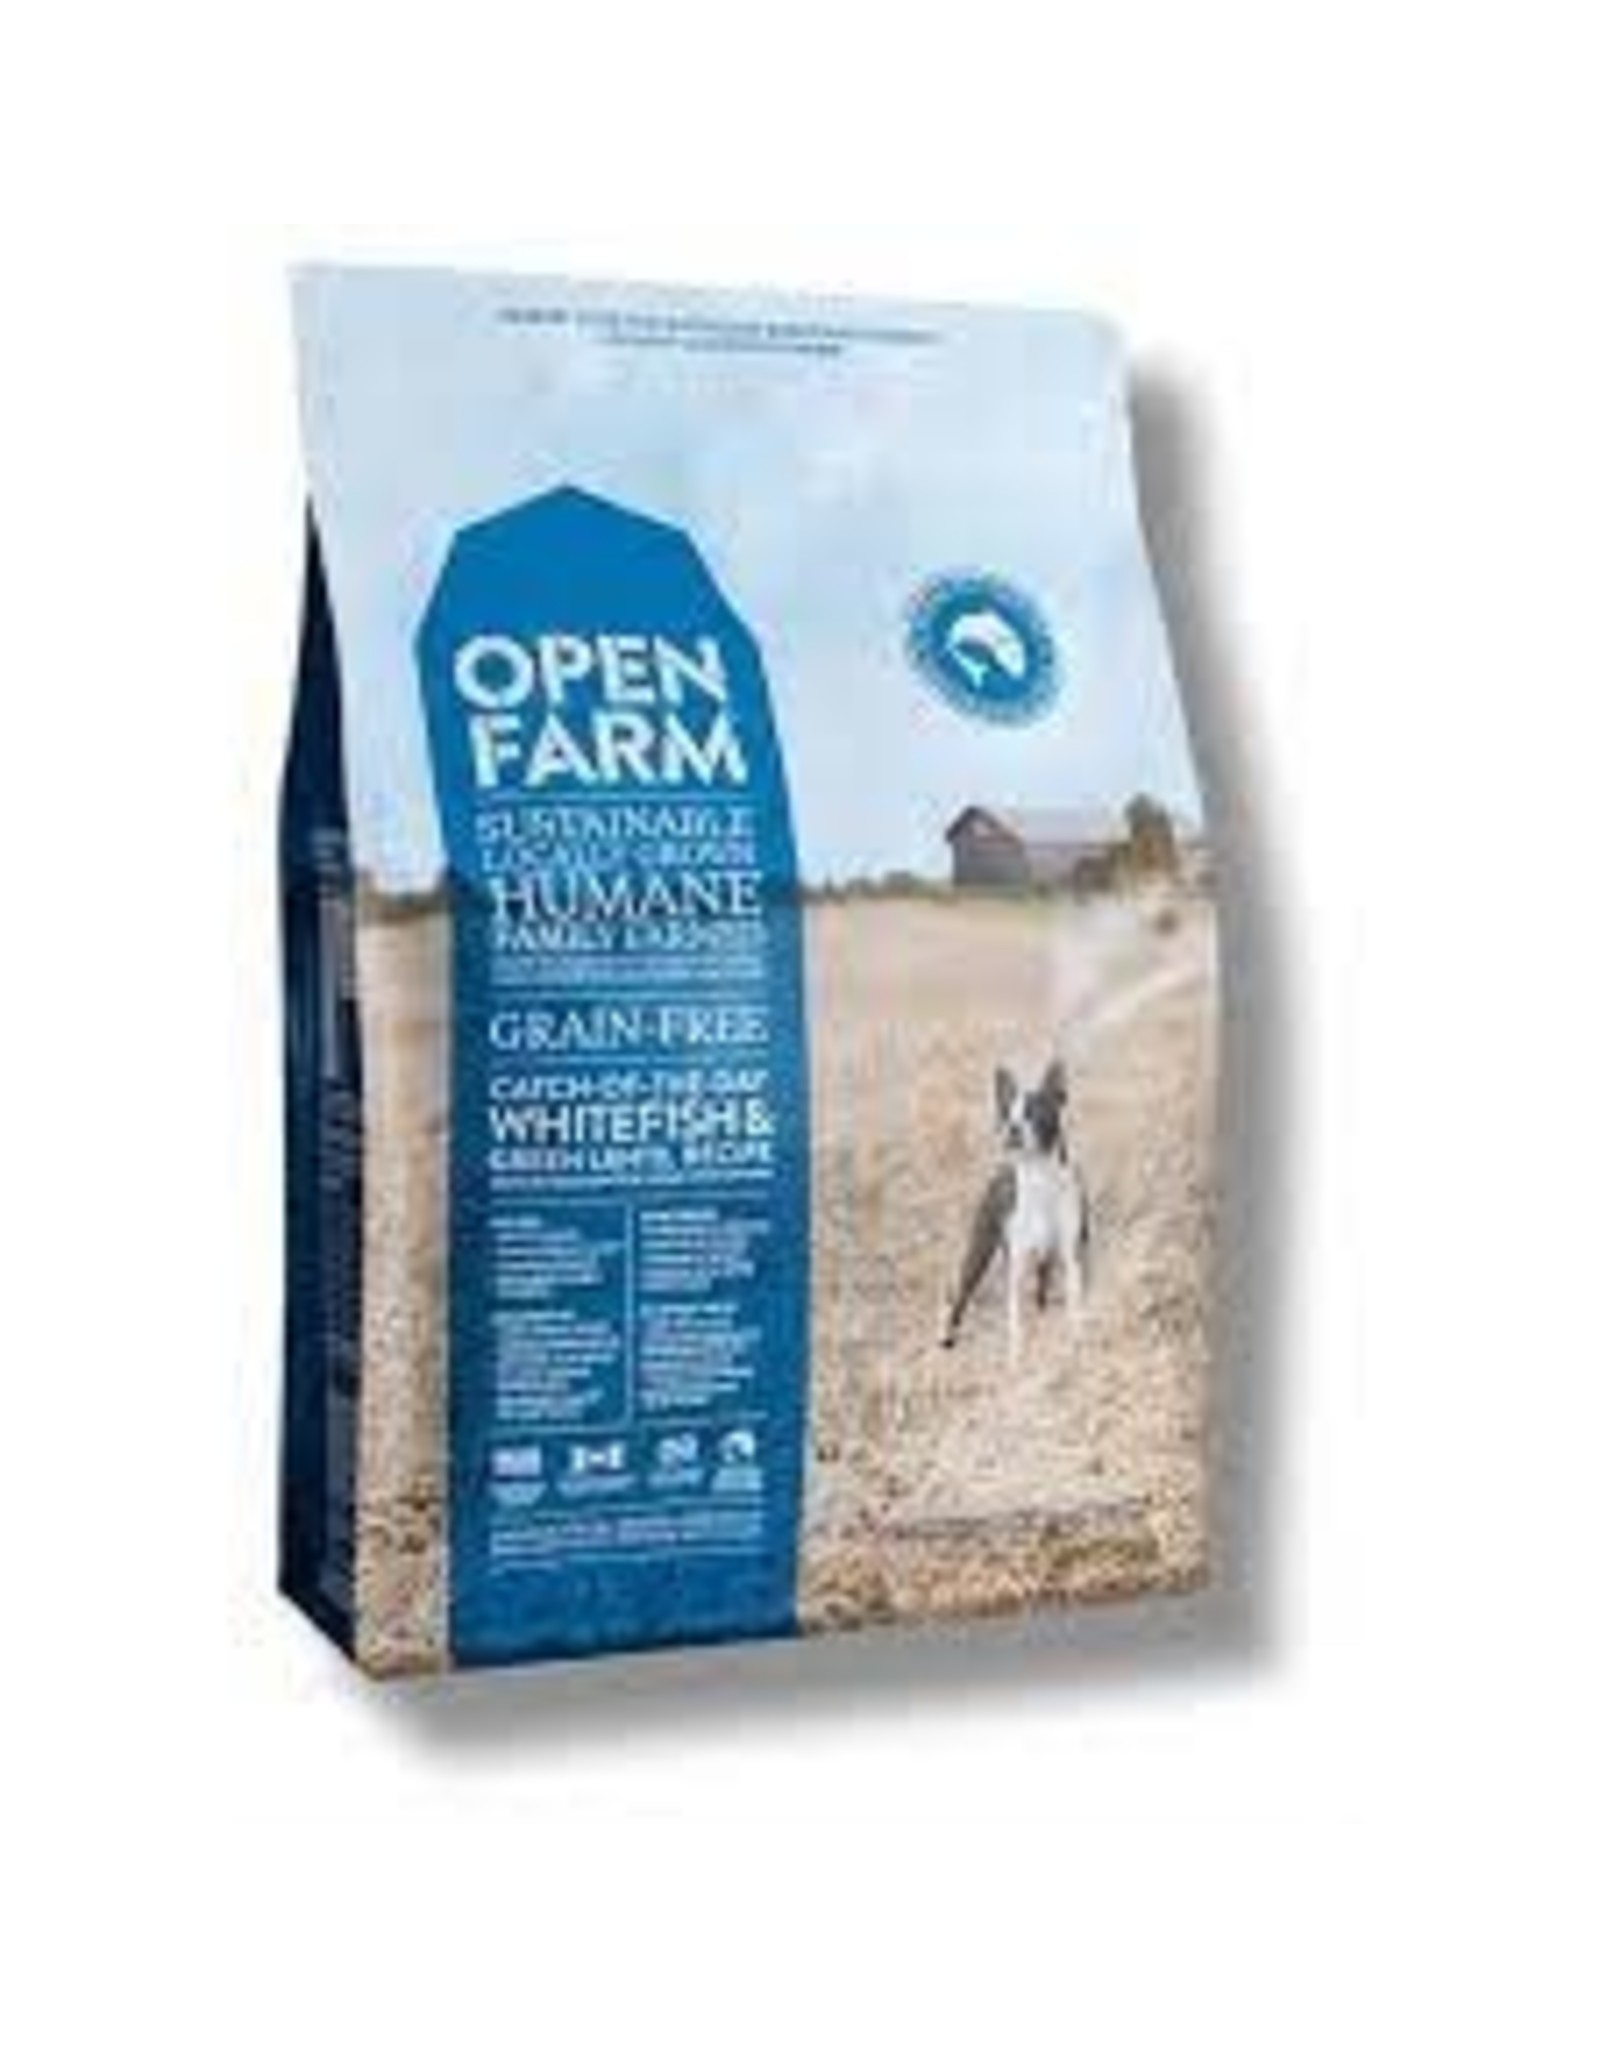 Open Farm Catch-of-the-Season Whitefish & Green Lentil